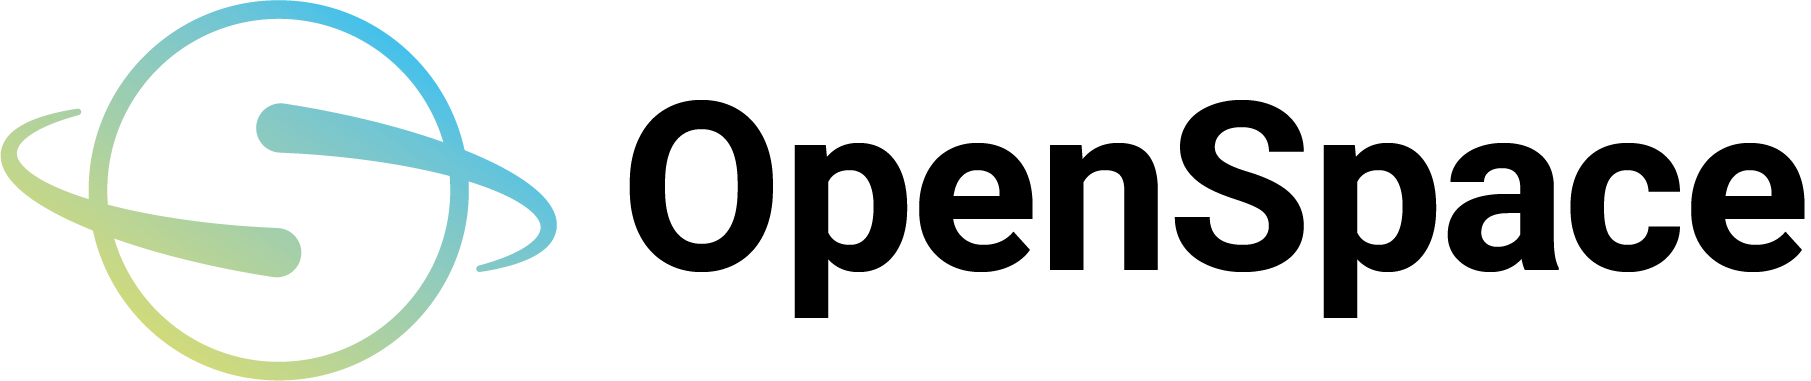 openspace logo